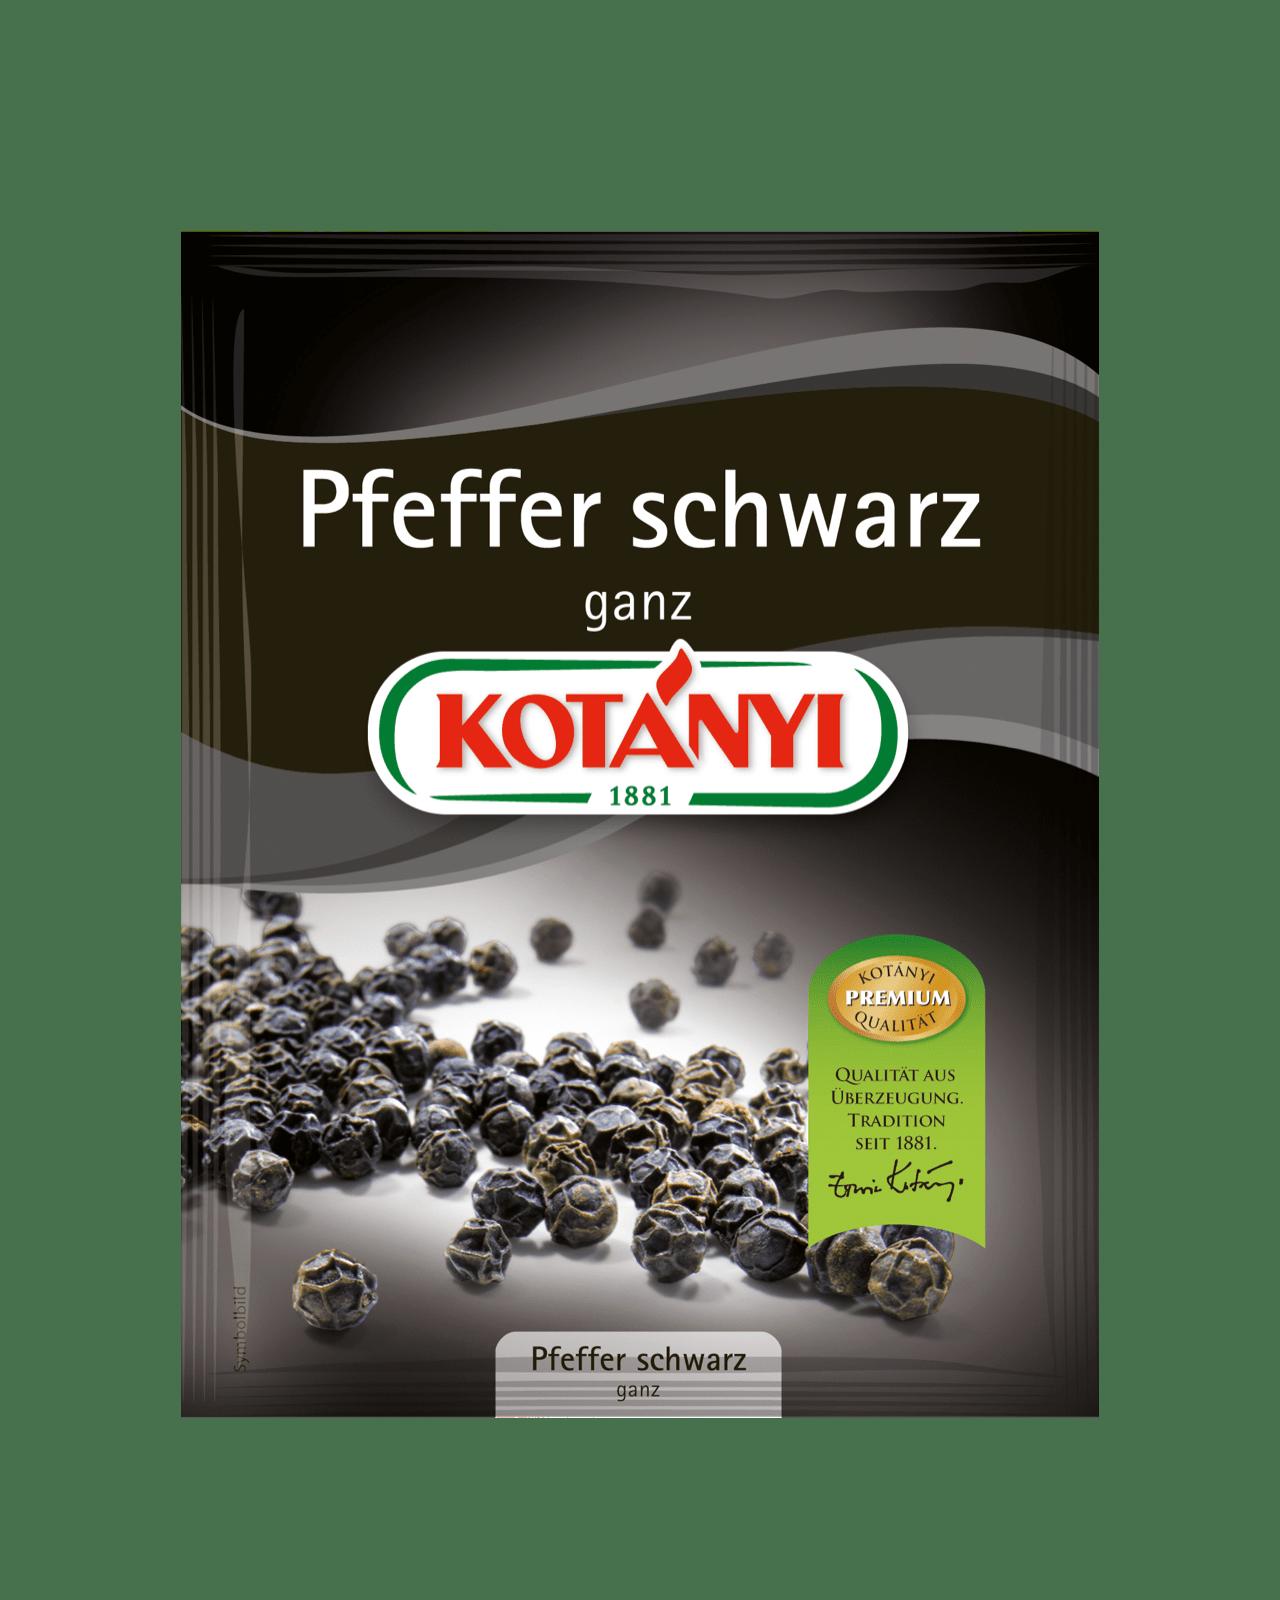 Kotányi Pfeffer schwarz ganz im Brief